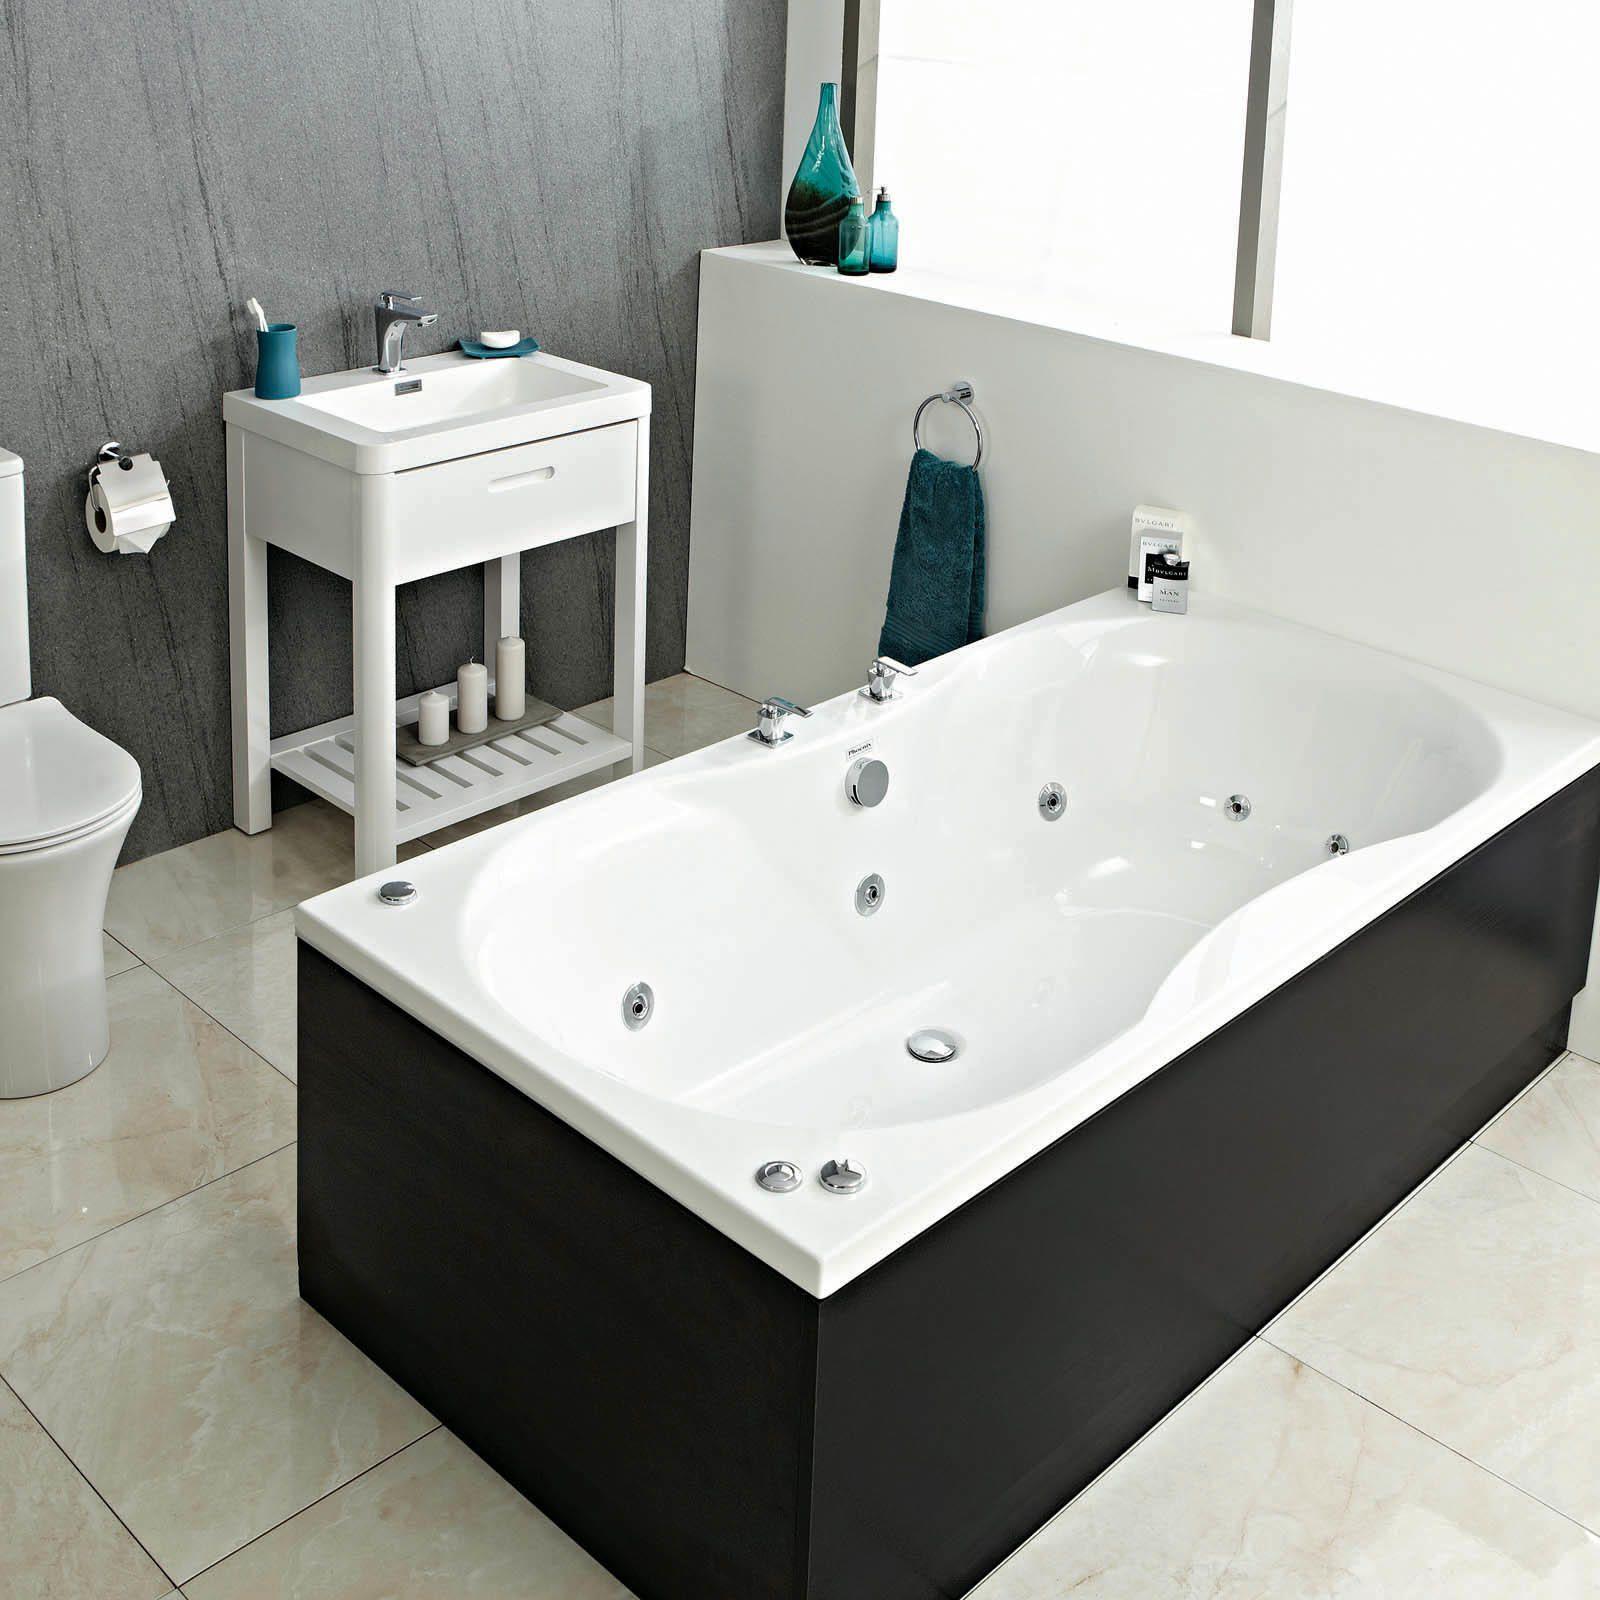 Body Zone Whirlpool Baths | thewhirlpoolbathshop.com | Body Zone ...